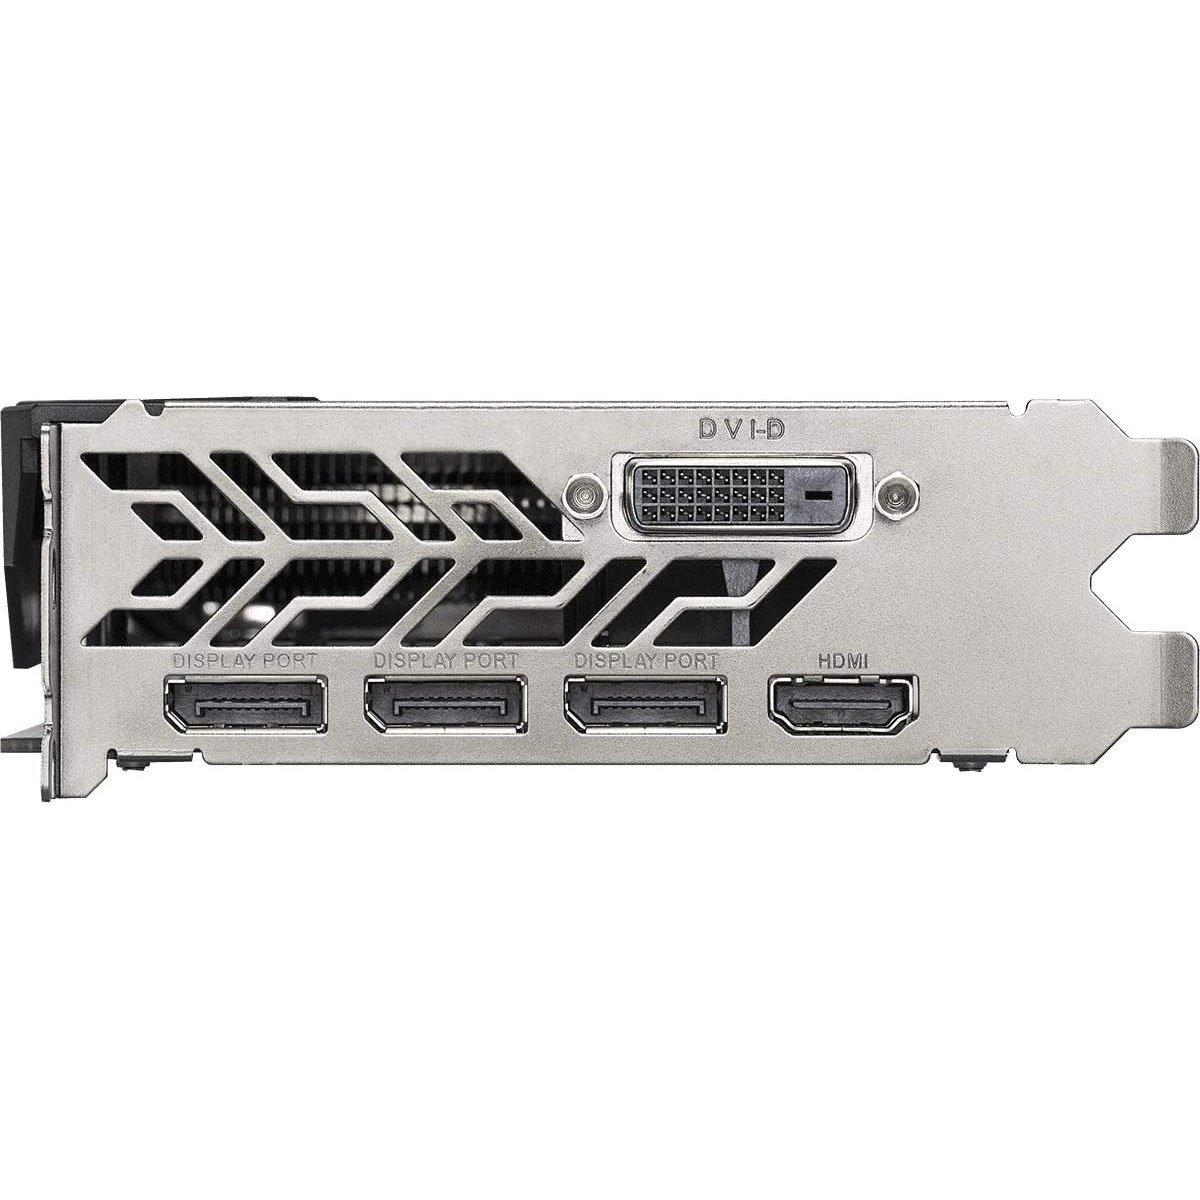 placa de video 4gb asrock rx 570 dual amd radeon phantom caming graphics card 2000mhz 256bit gddr6 dp dvi hdmi 51080 2000 203646 2